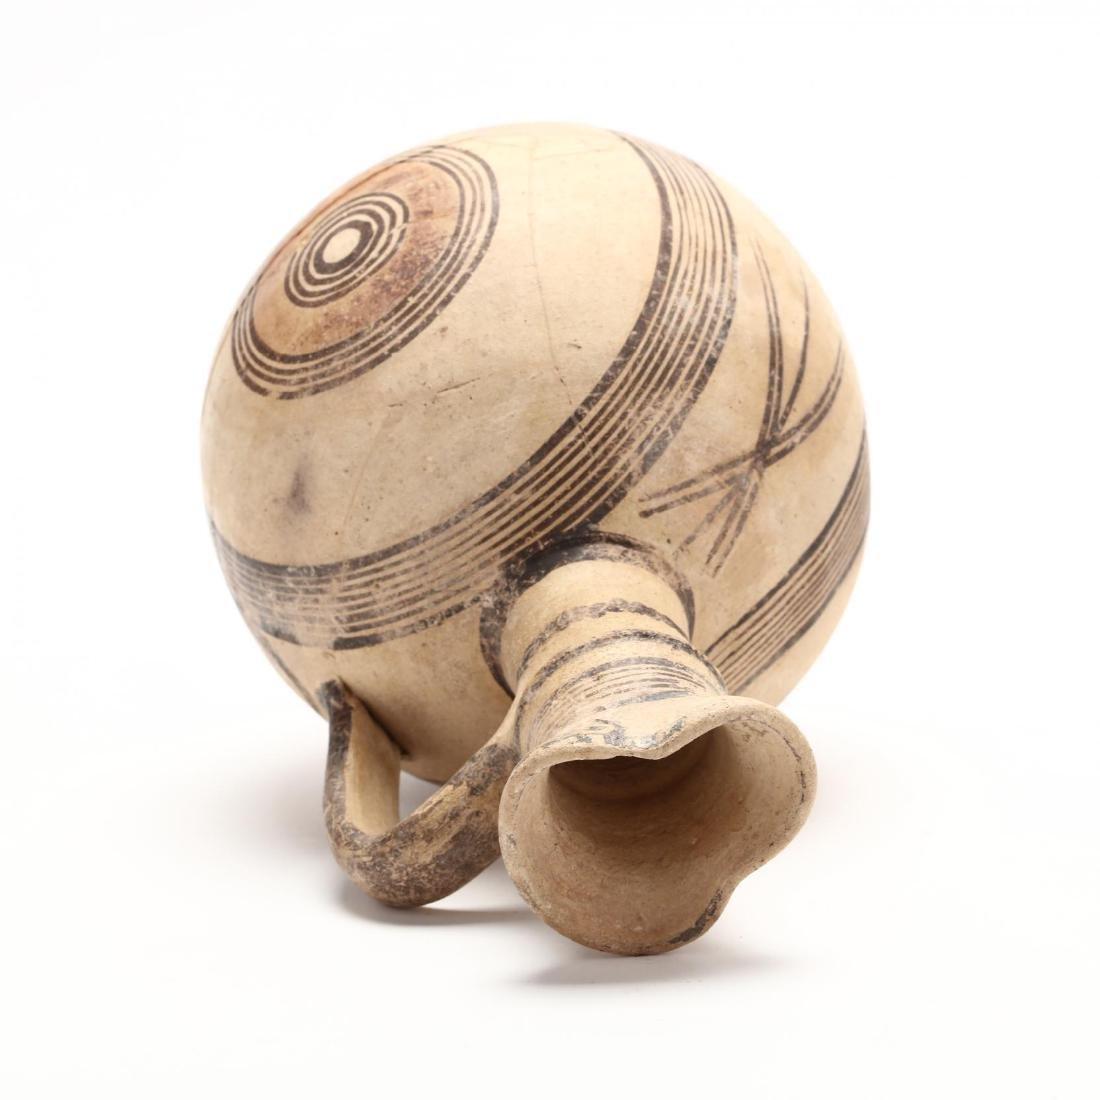 Cyprio-Archaic Barrel Form Bichrome Pitcher - 2